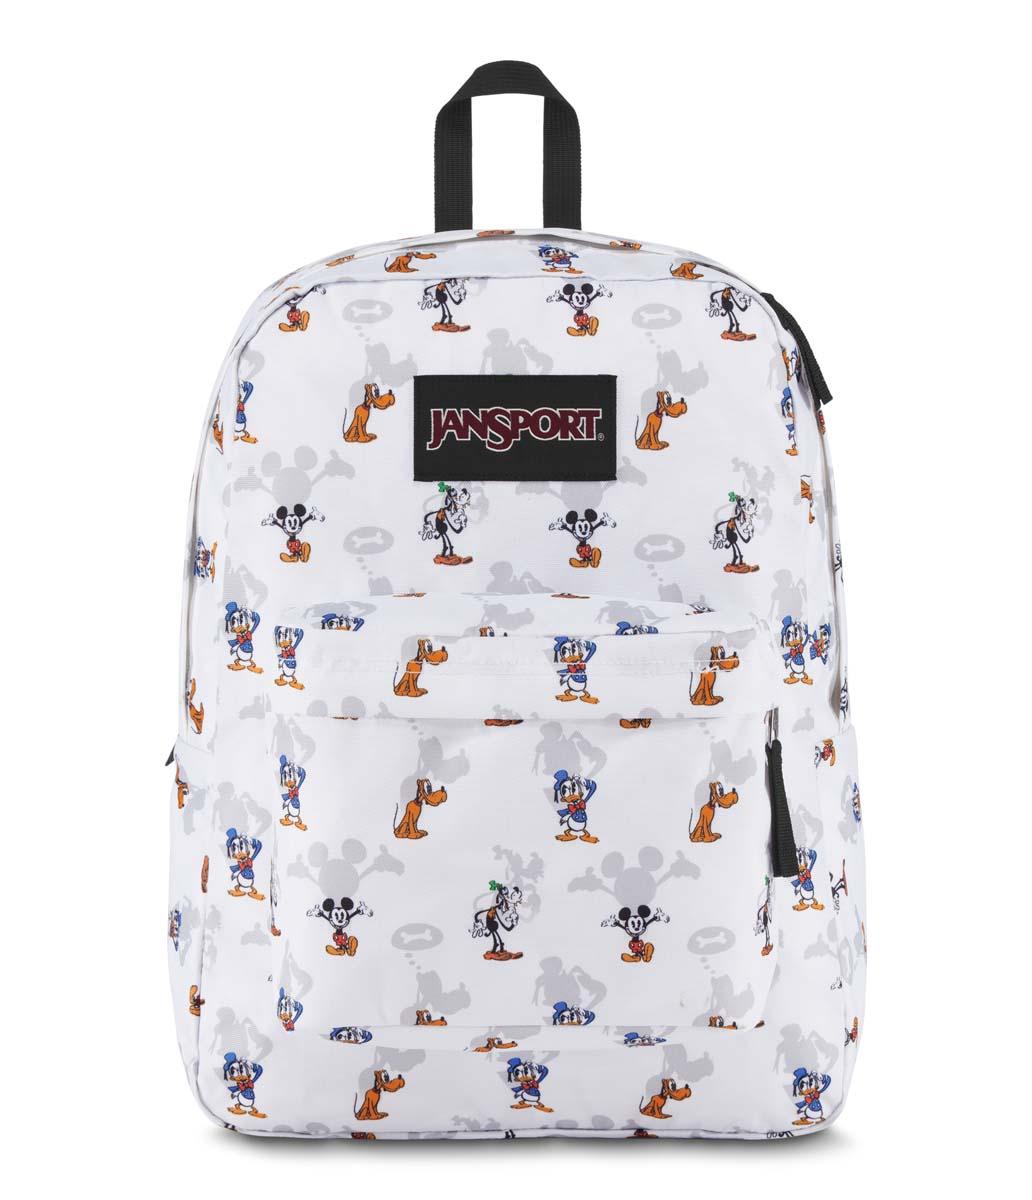 JanSport กระเป๋าเป้ รุ่น Superbreak - Disney Fab Shodows White